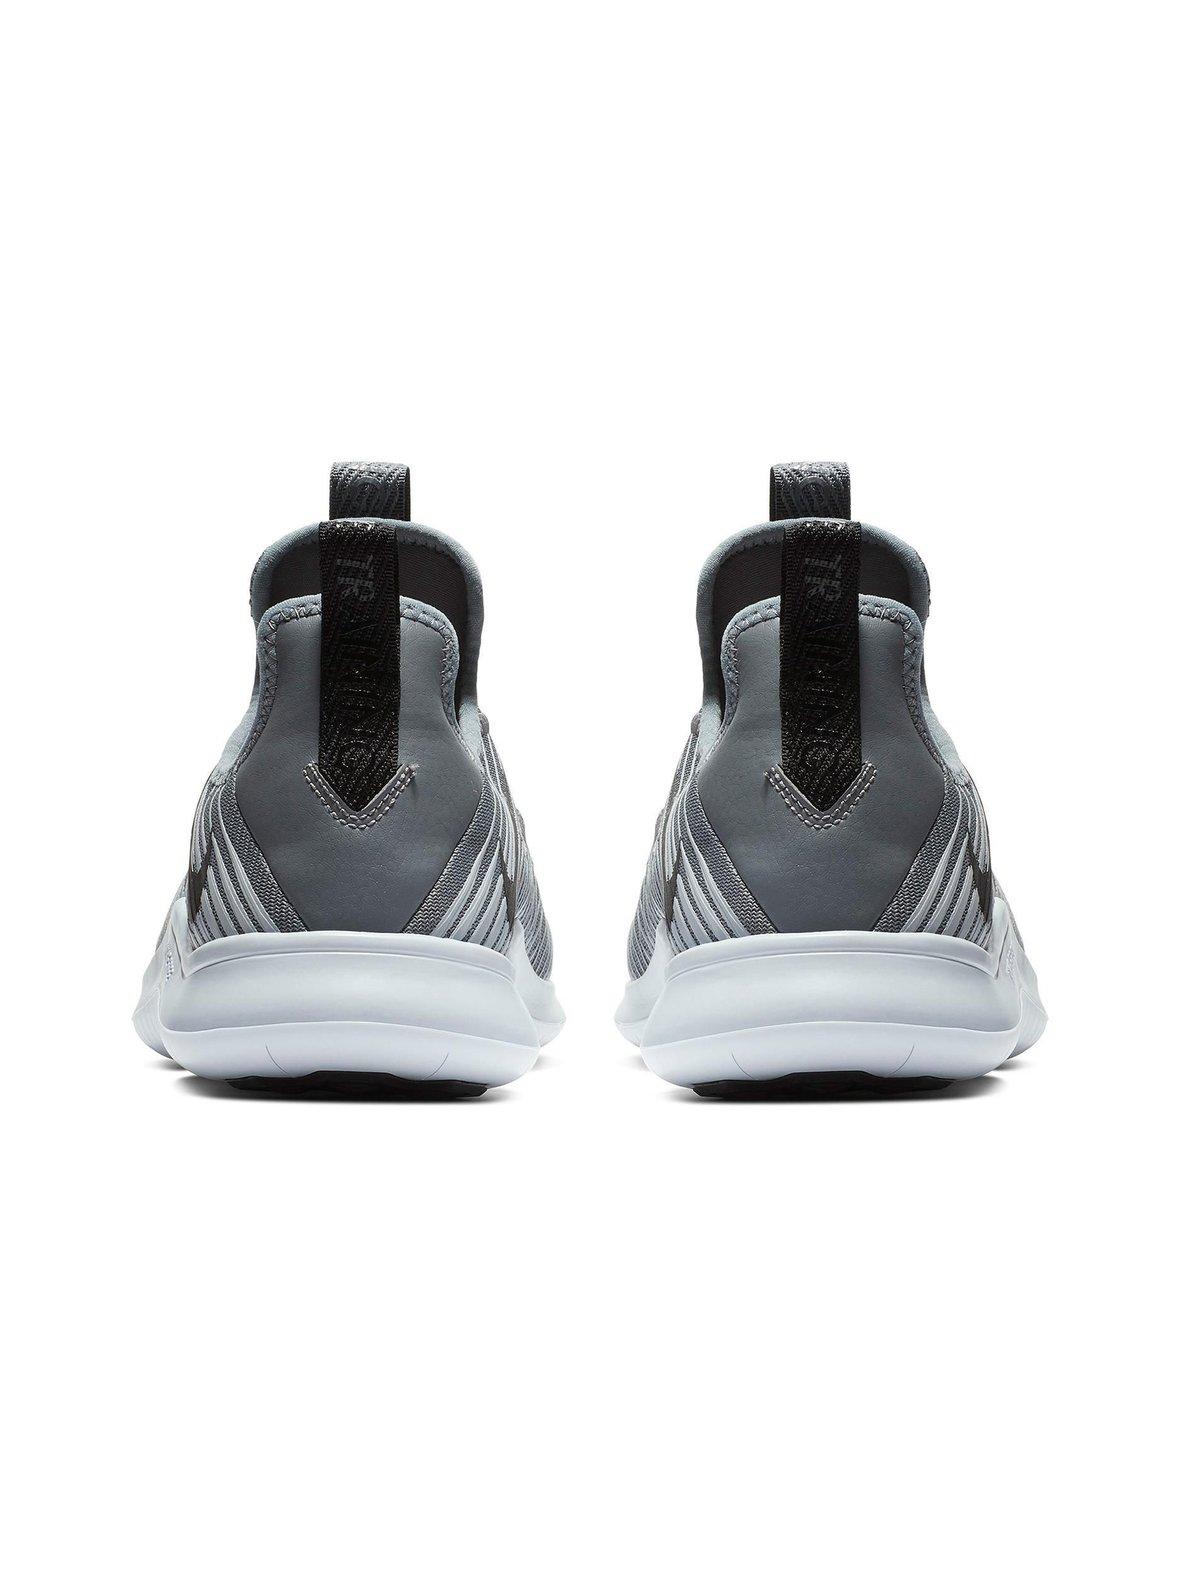 Grey Free 5 10 Tr Greywolf Treenikengät Ultra Nike Cool wzCF5qn